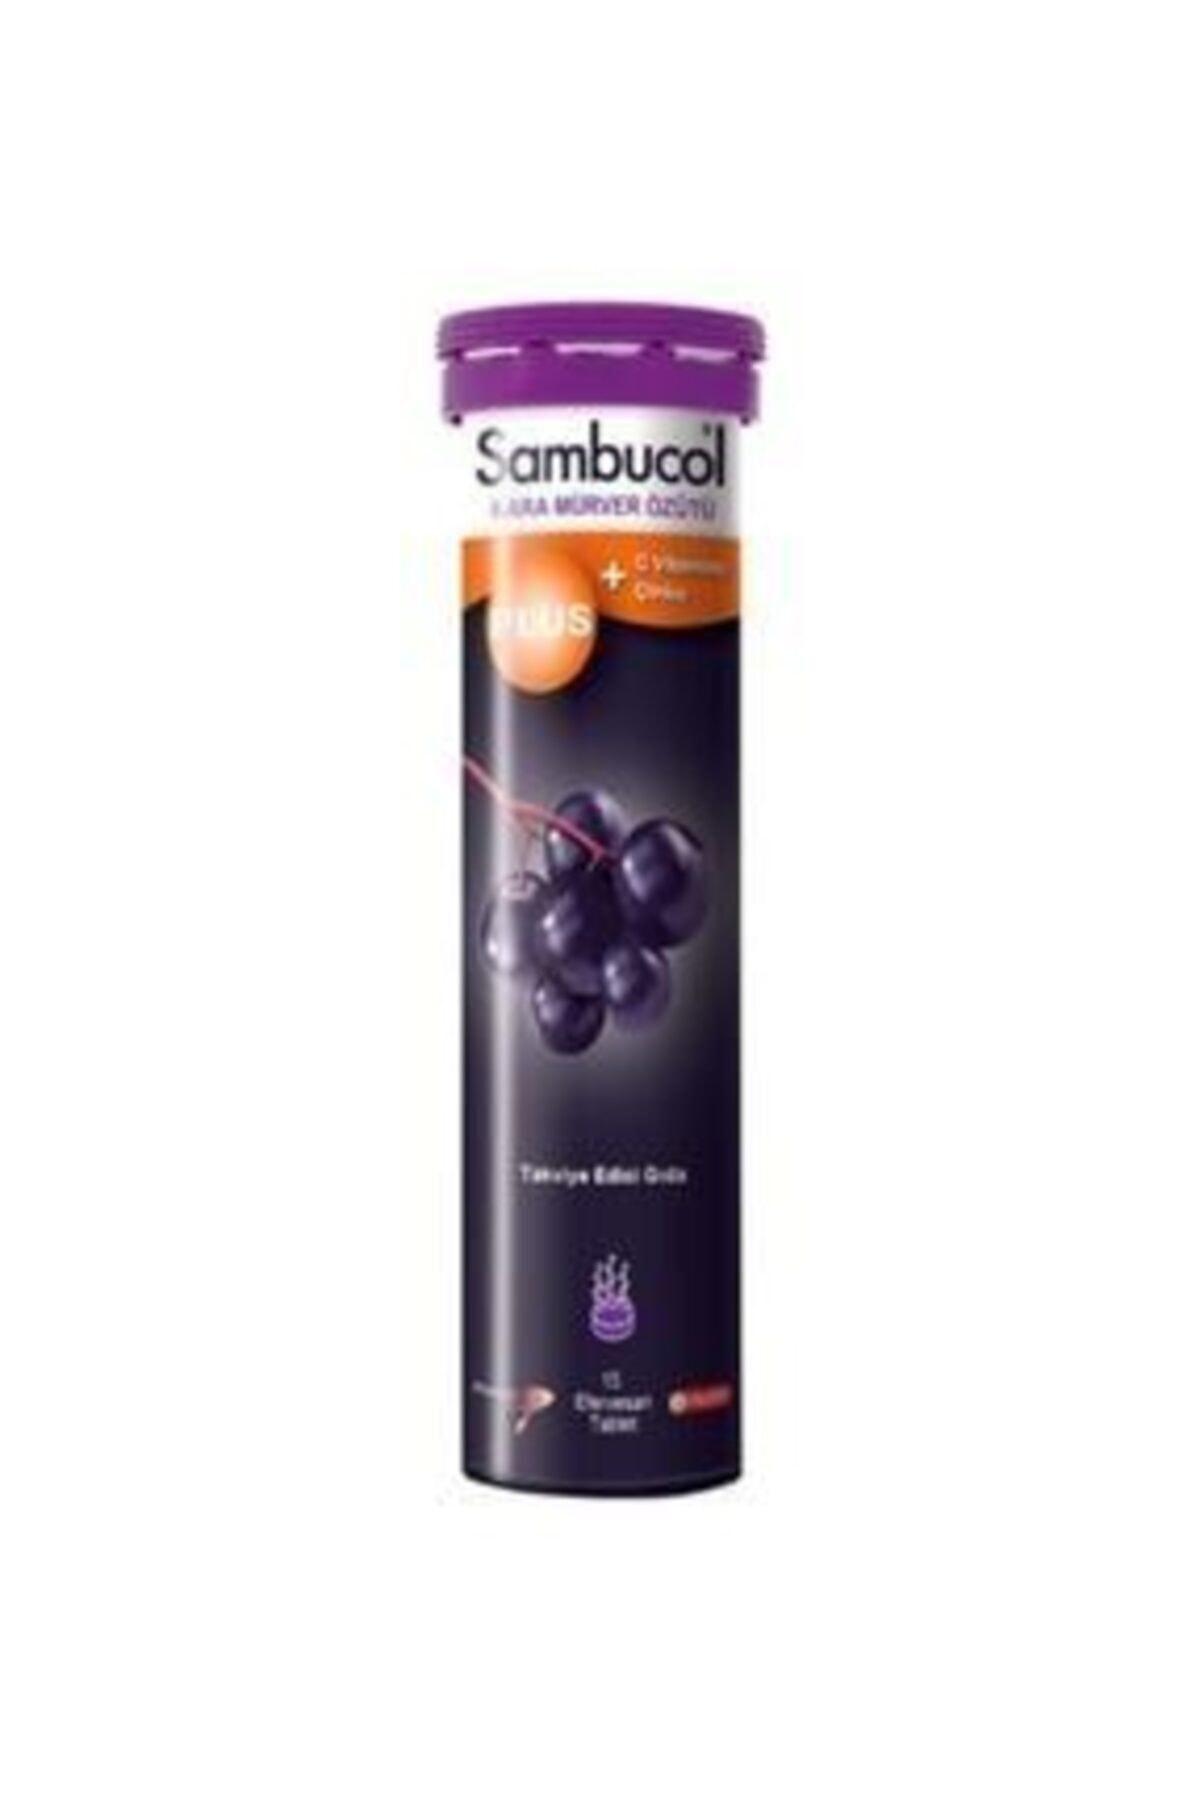 Sambucol Plus Kara Mürver + C Vitamini Çinko Takviye Edici Gıda 15 Tablet 1